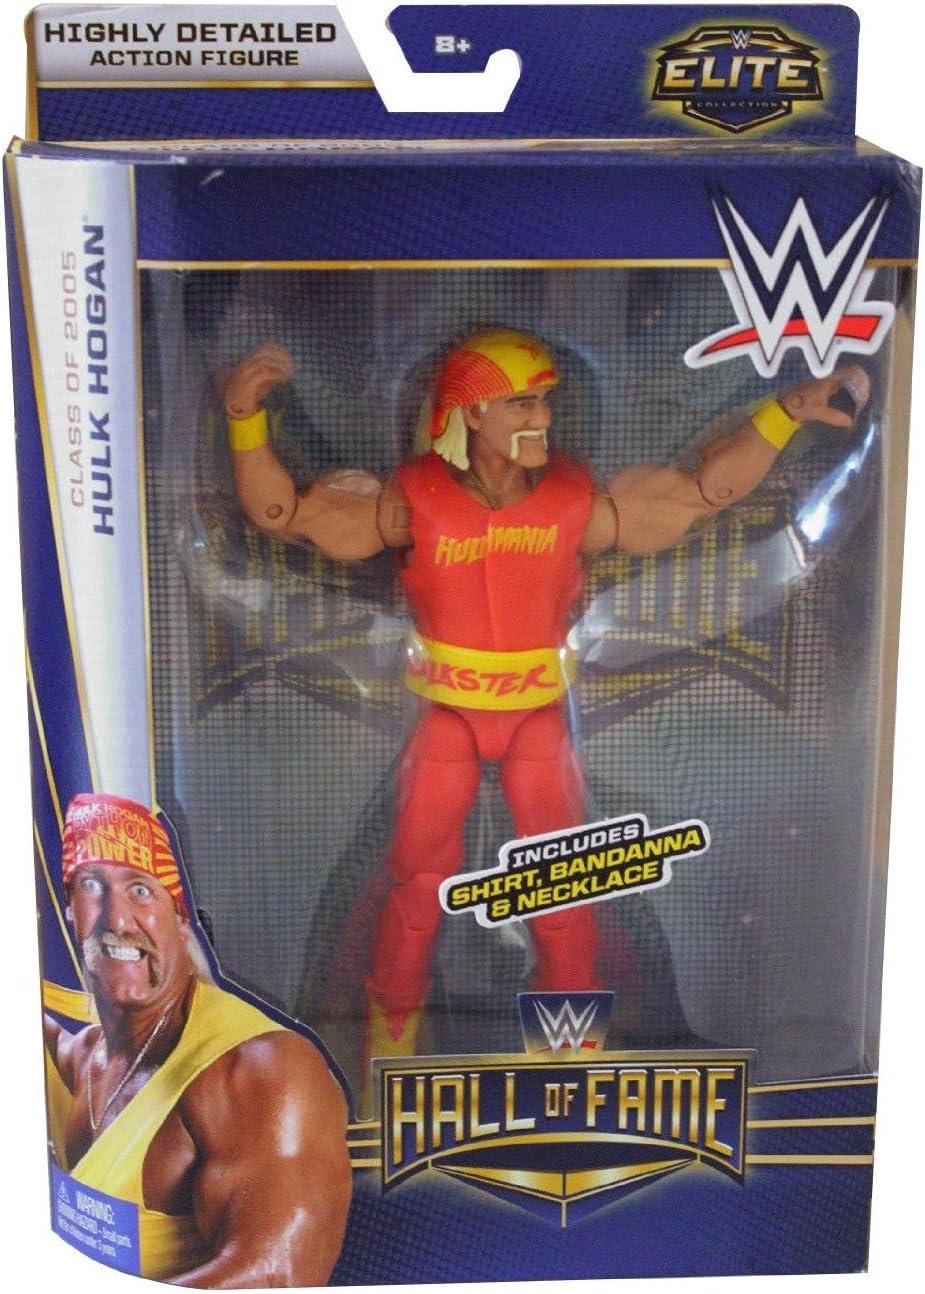 Mattel WWE Elite Hall of Fame Hulk Hogan Class of 2005